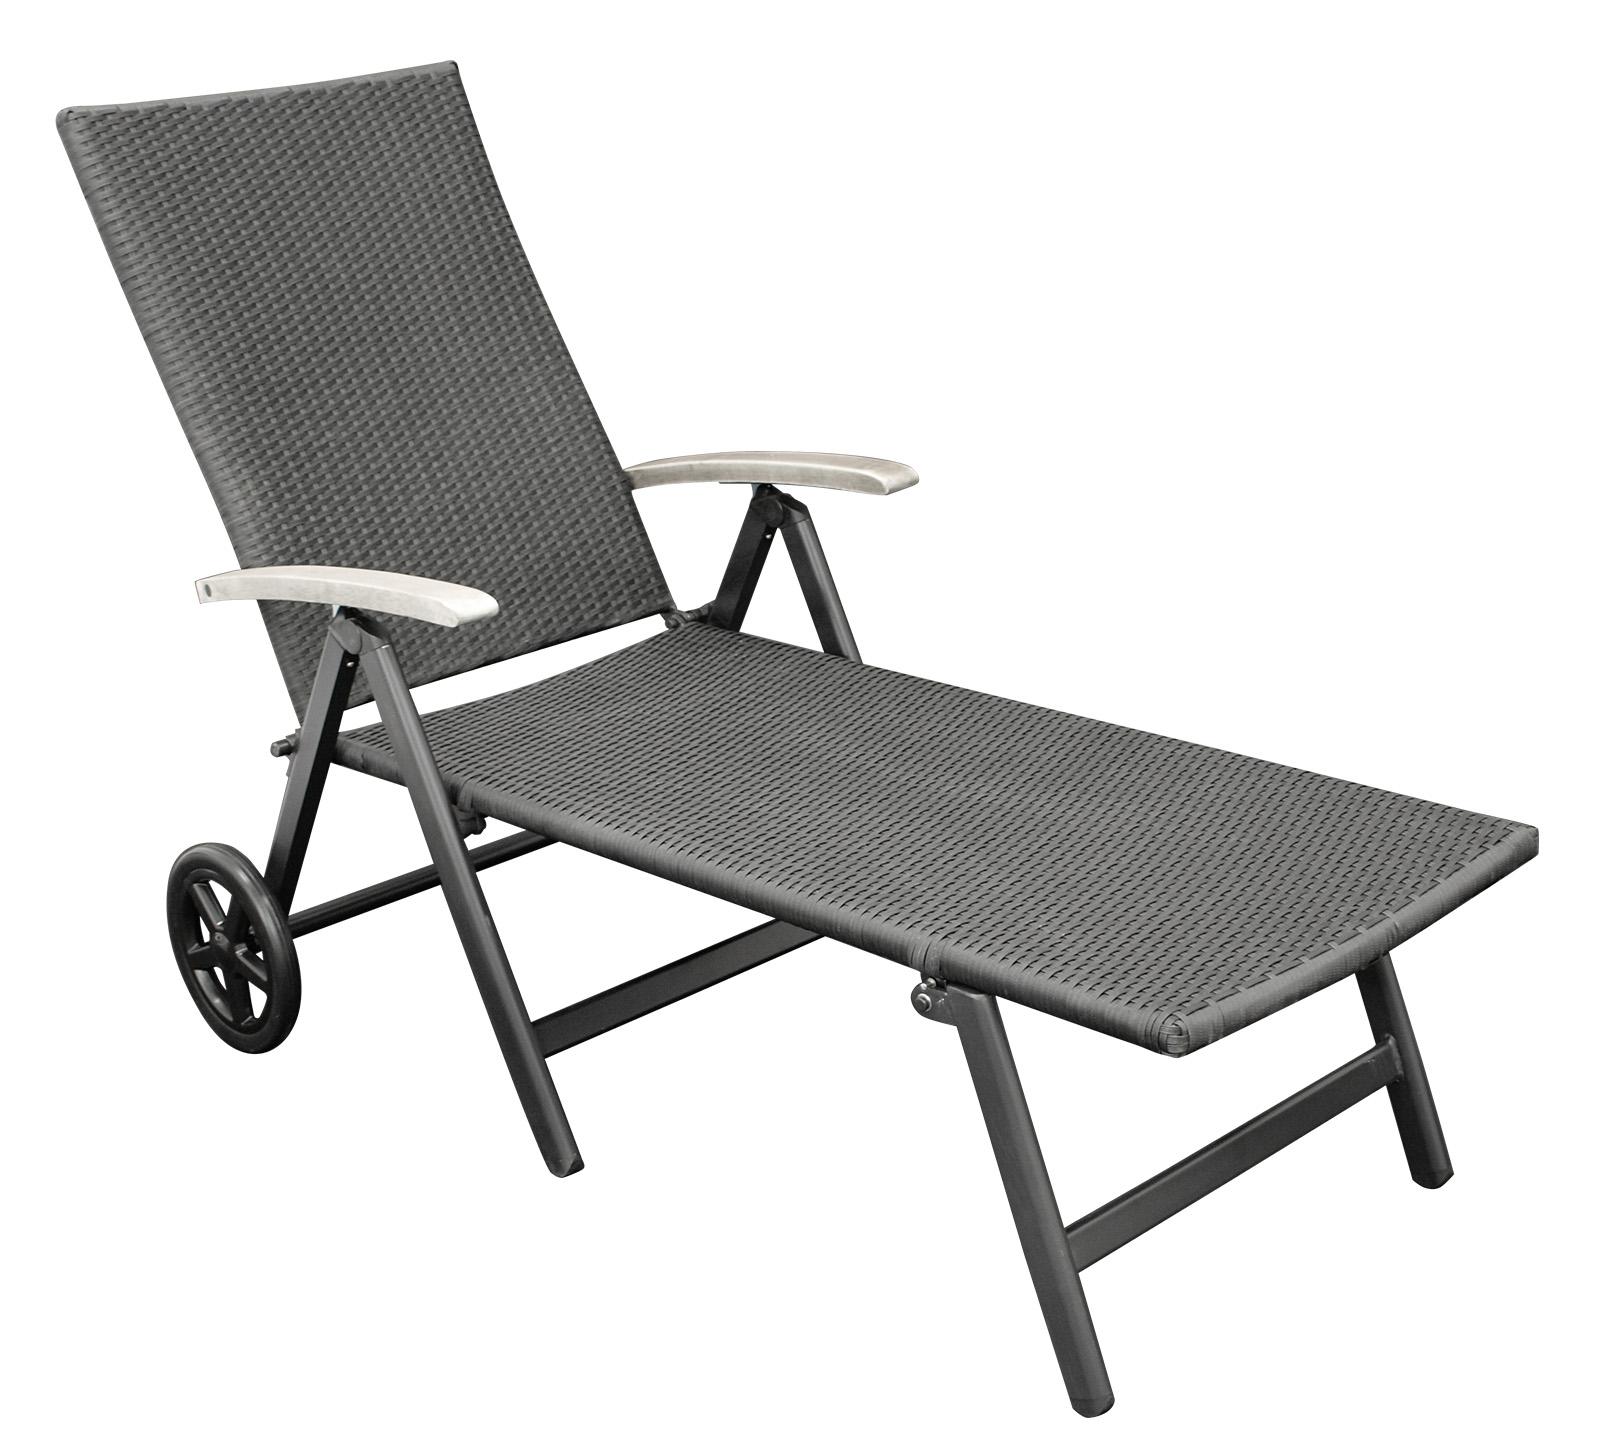 rollenliege sonnenliege rollliege aluminium grau. Black Bedroom Furniture Sets. Home Design Ideas